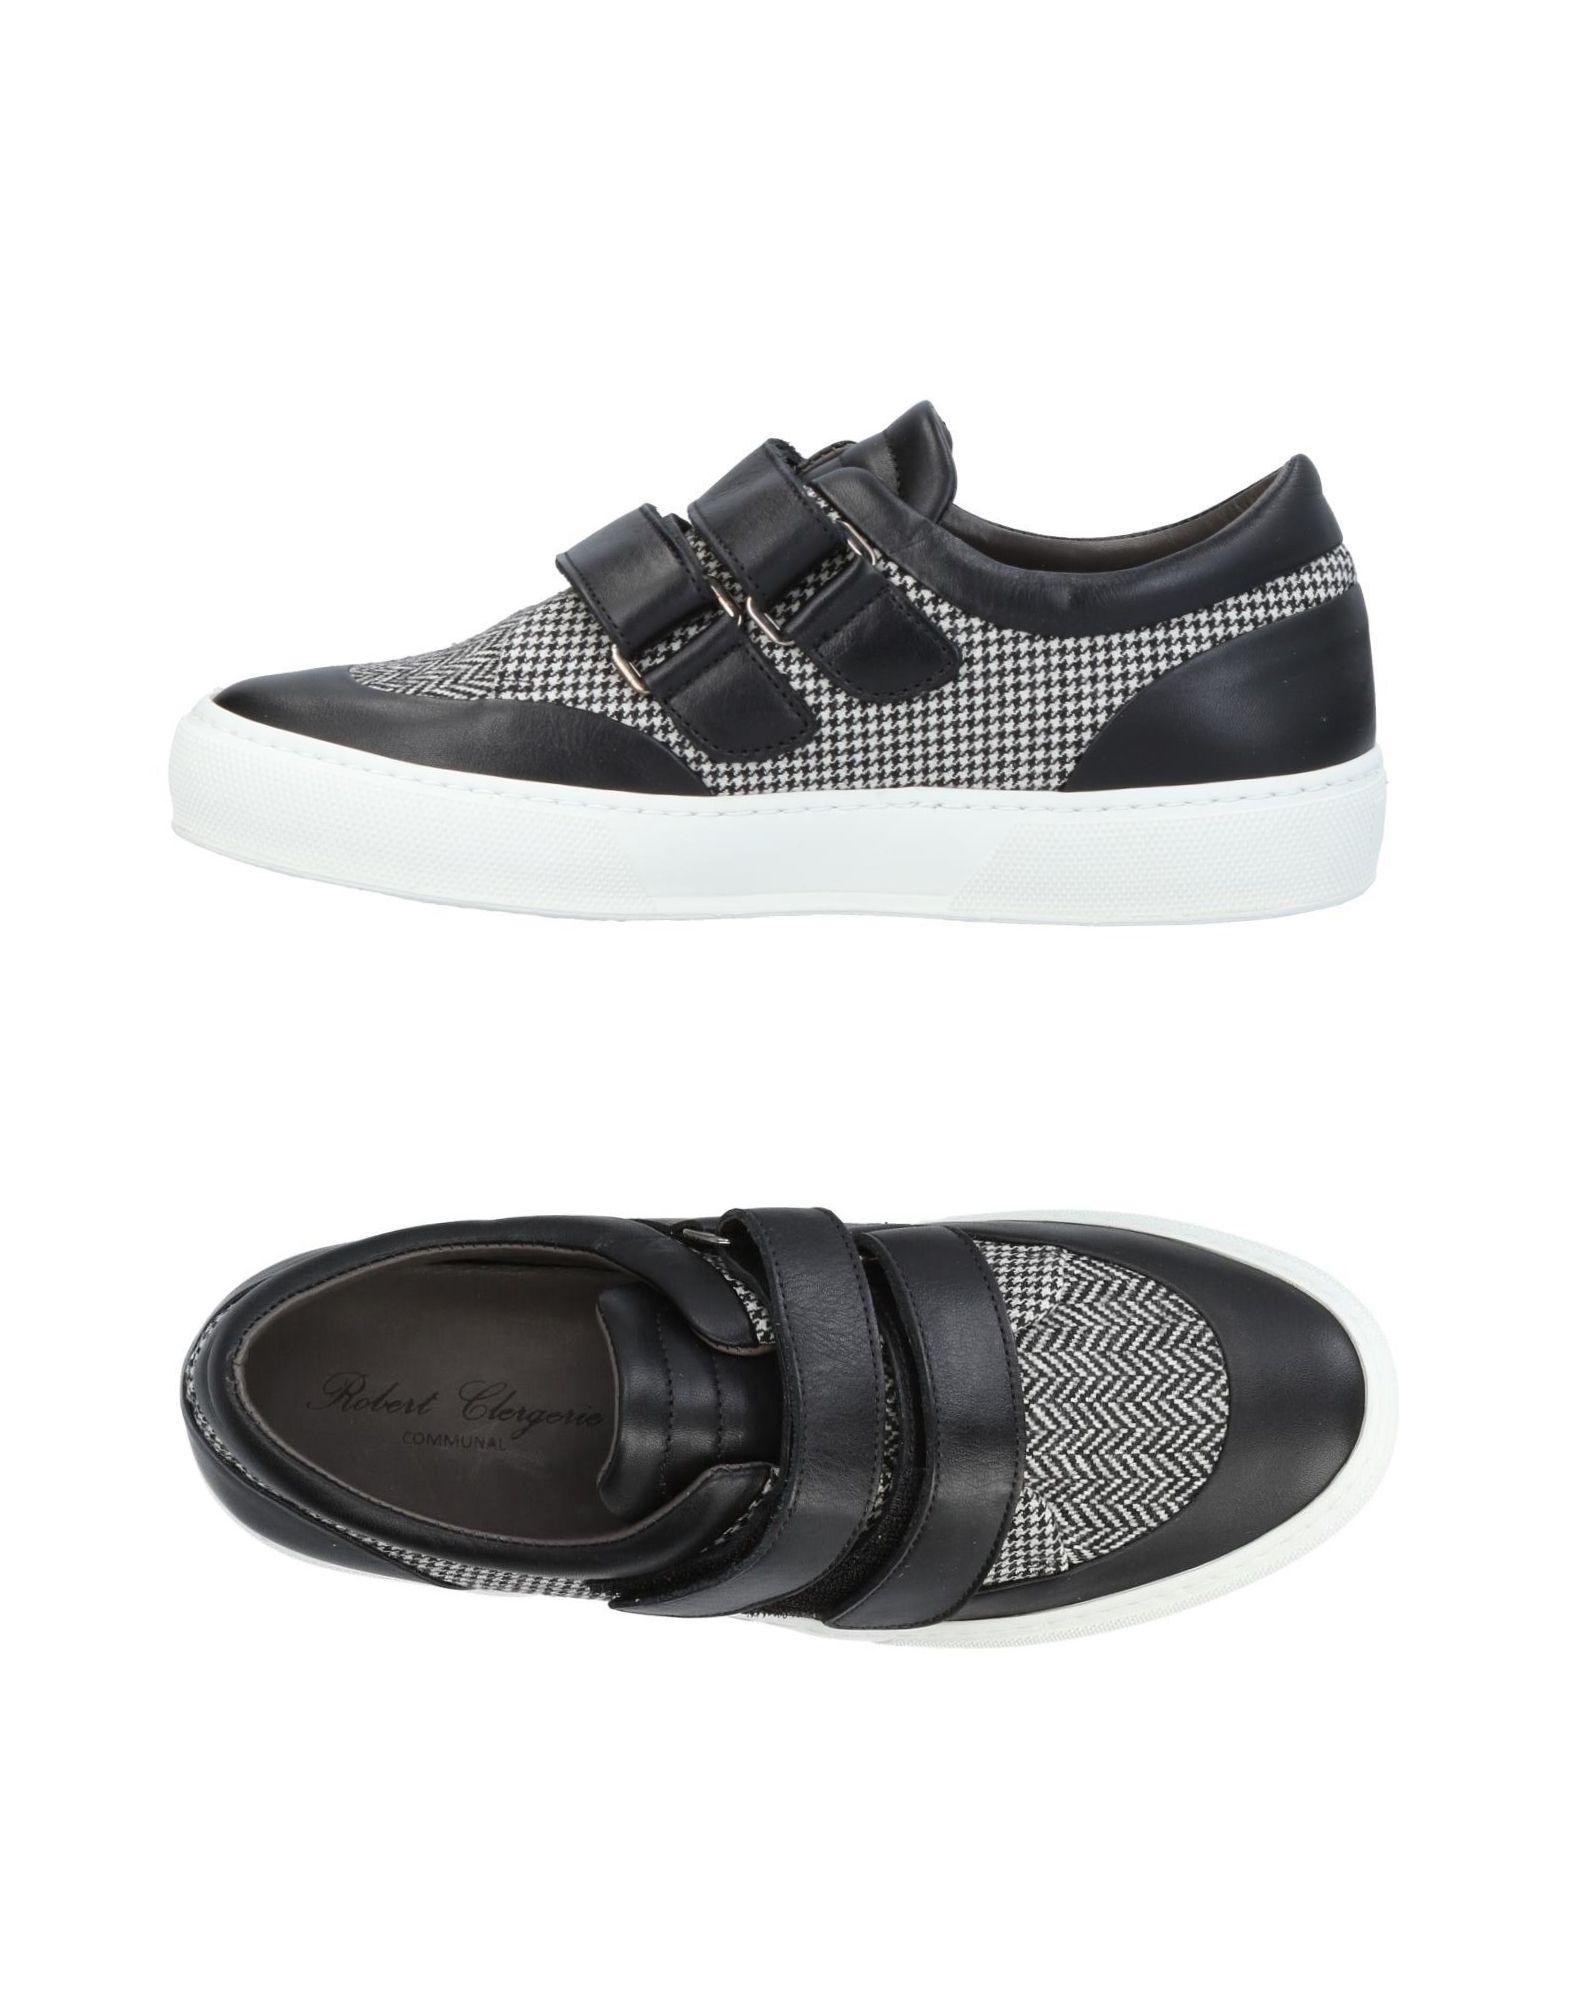 Gut um billige Schuhe zu  tragenRobert Clergerie Sneakers Damen  zu 11427798CO 6fc6c6